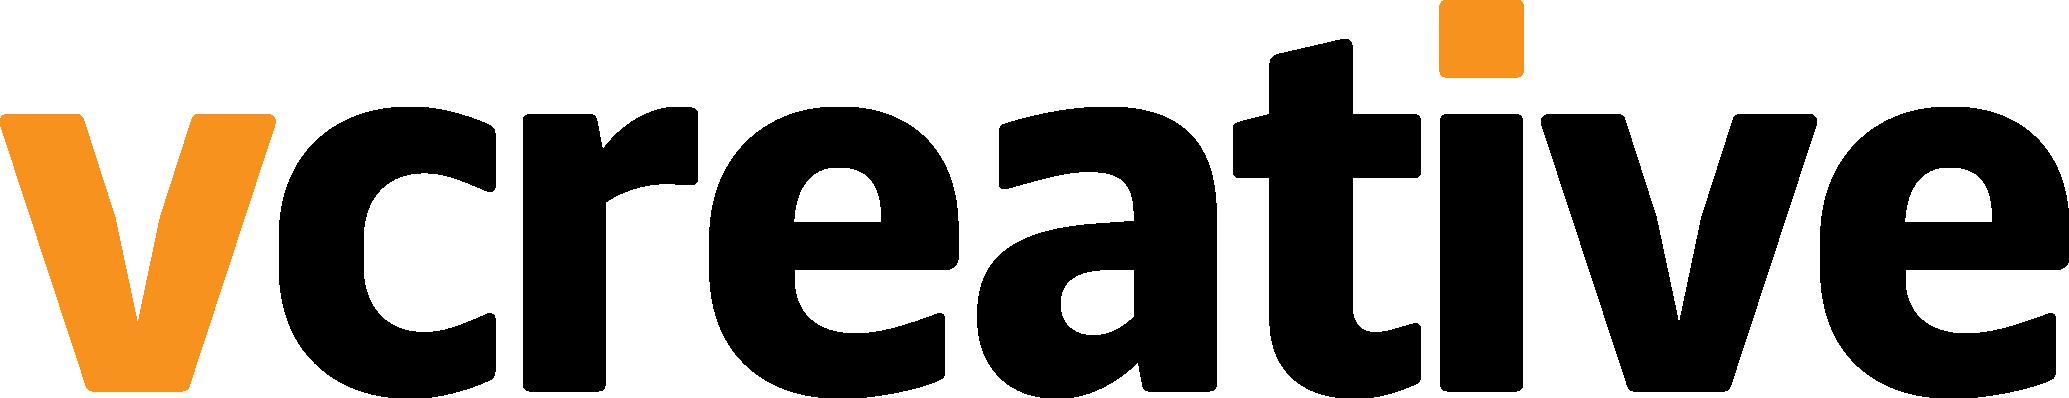 vCreative_Logo_RGB.png